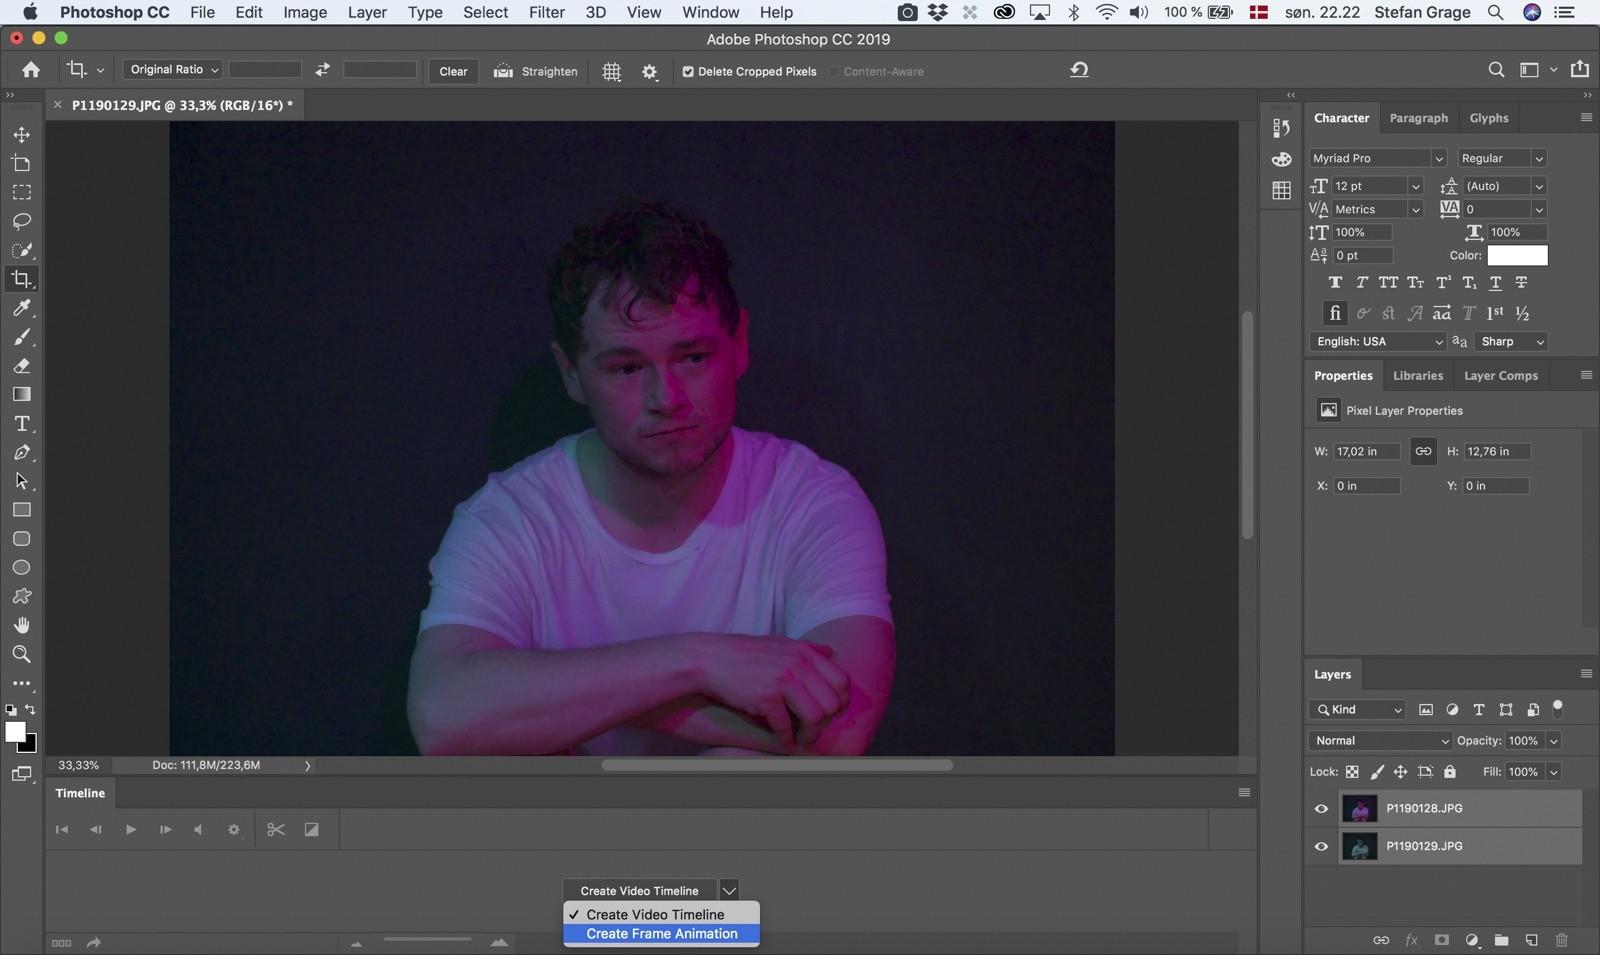 Photoshop: Create Frame Animation